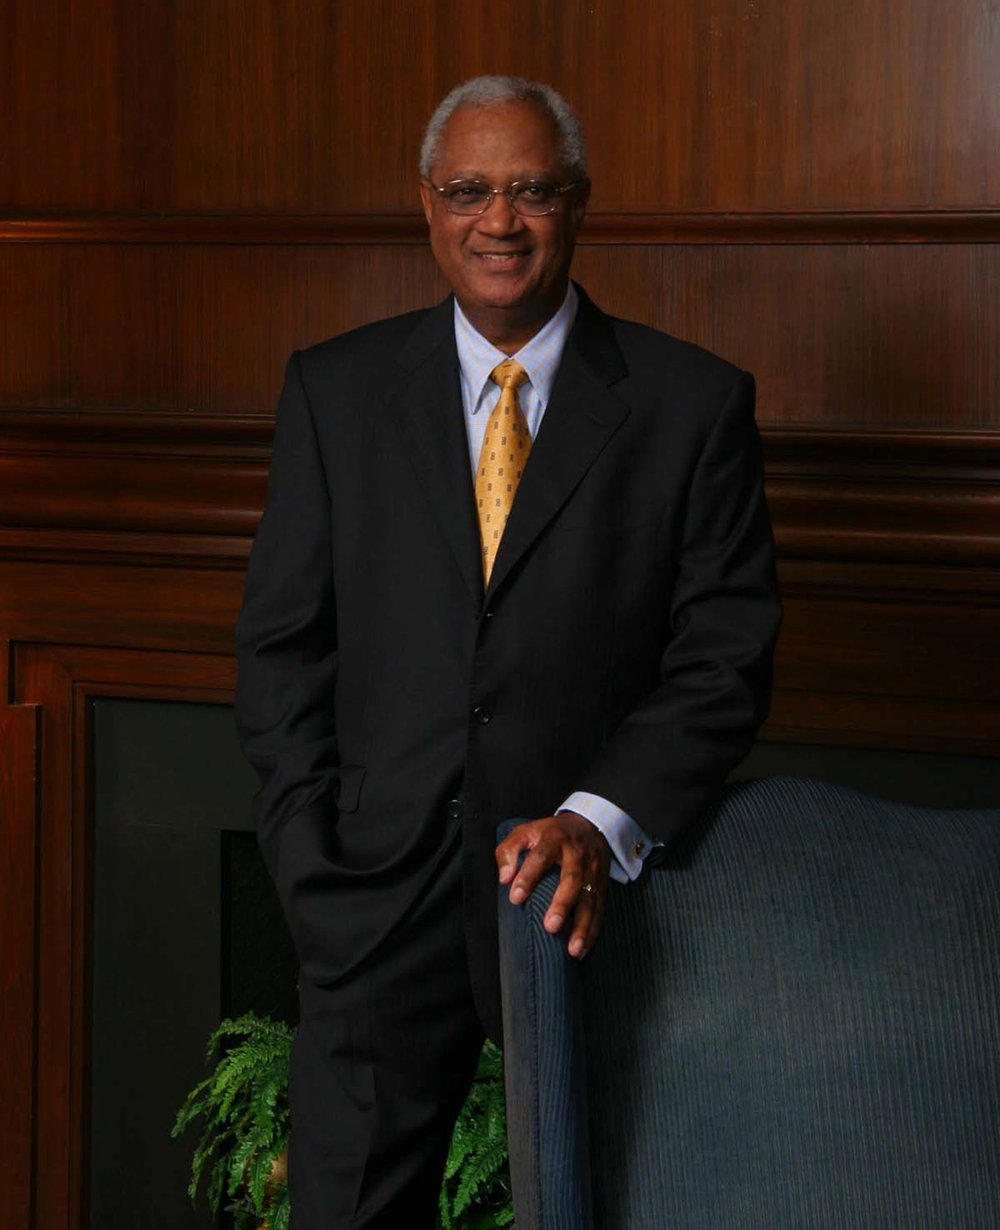 Marvin (Bob) Nicholas President & CEO  o: 713-880-0195 m: 281-788-0093   bnicholas@nicholasearth.com